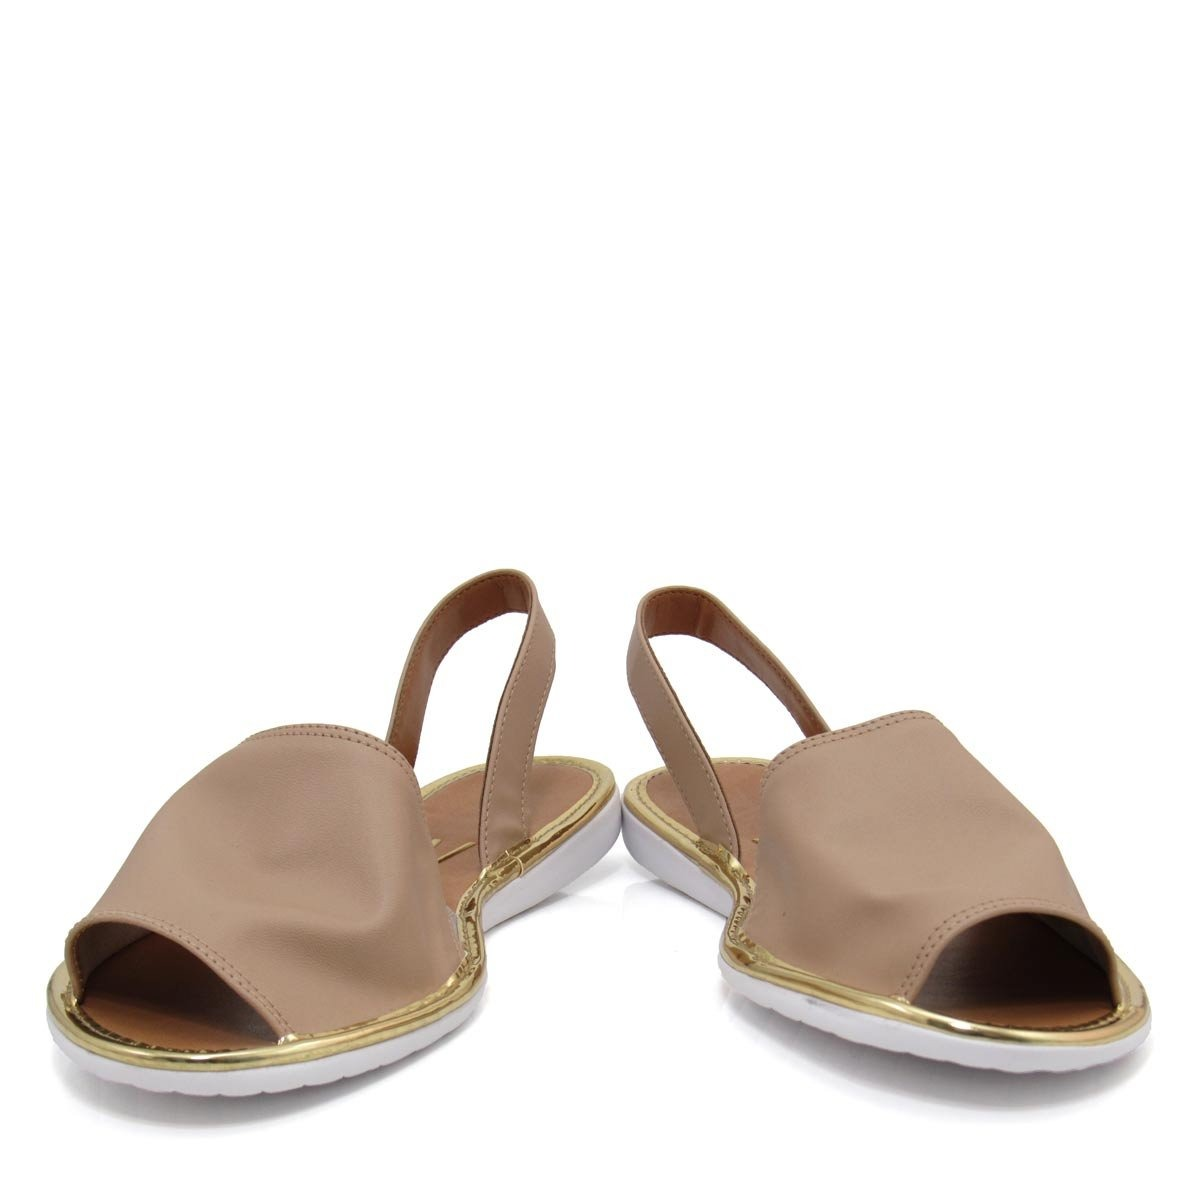 88e7eebc2f sandália rasteira avarca feminina vizzano 6280100 pelica. Carregando zoom.